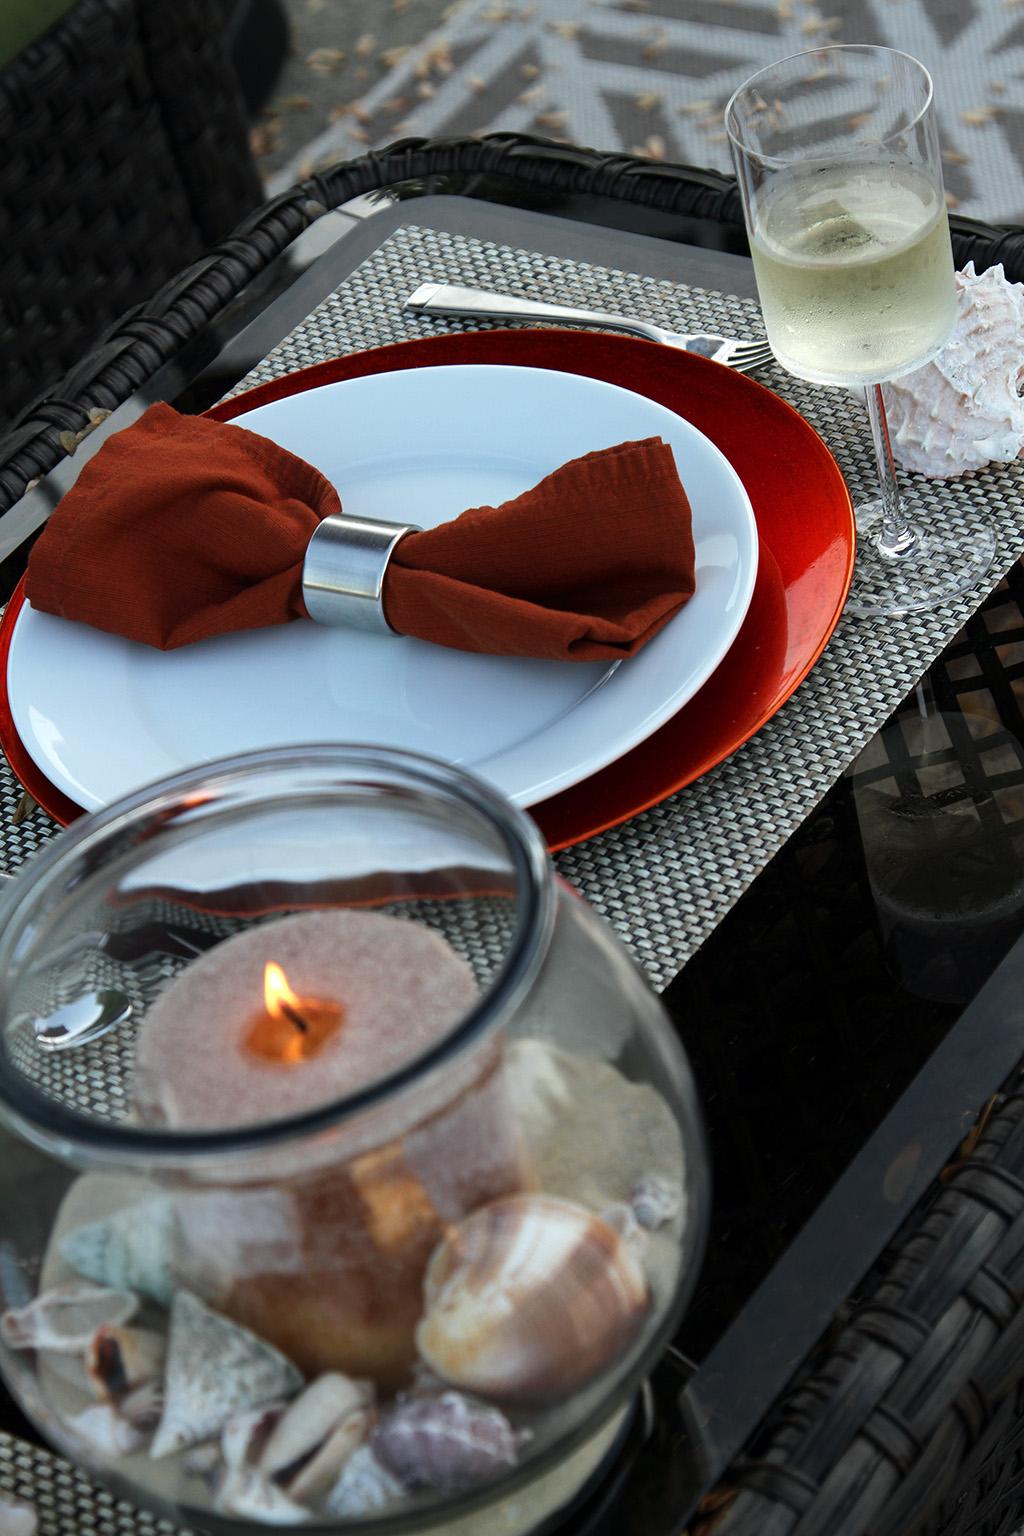 Table Setting with Orange Napkins